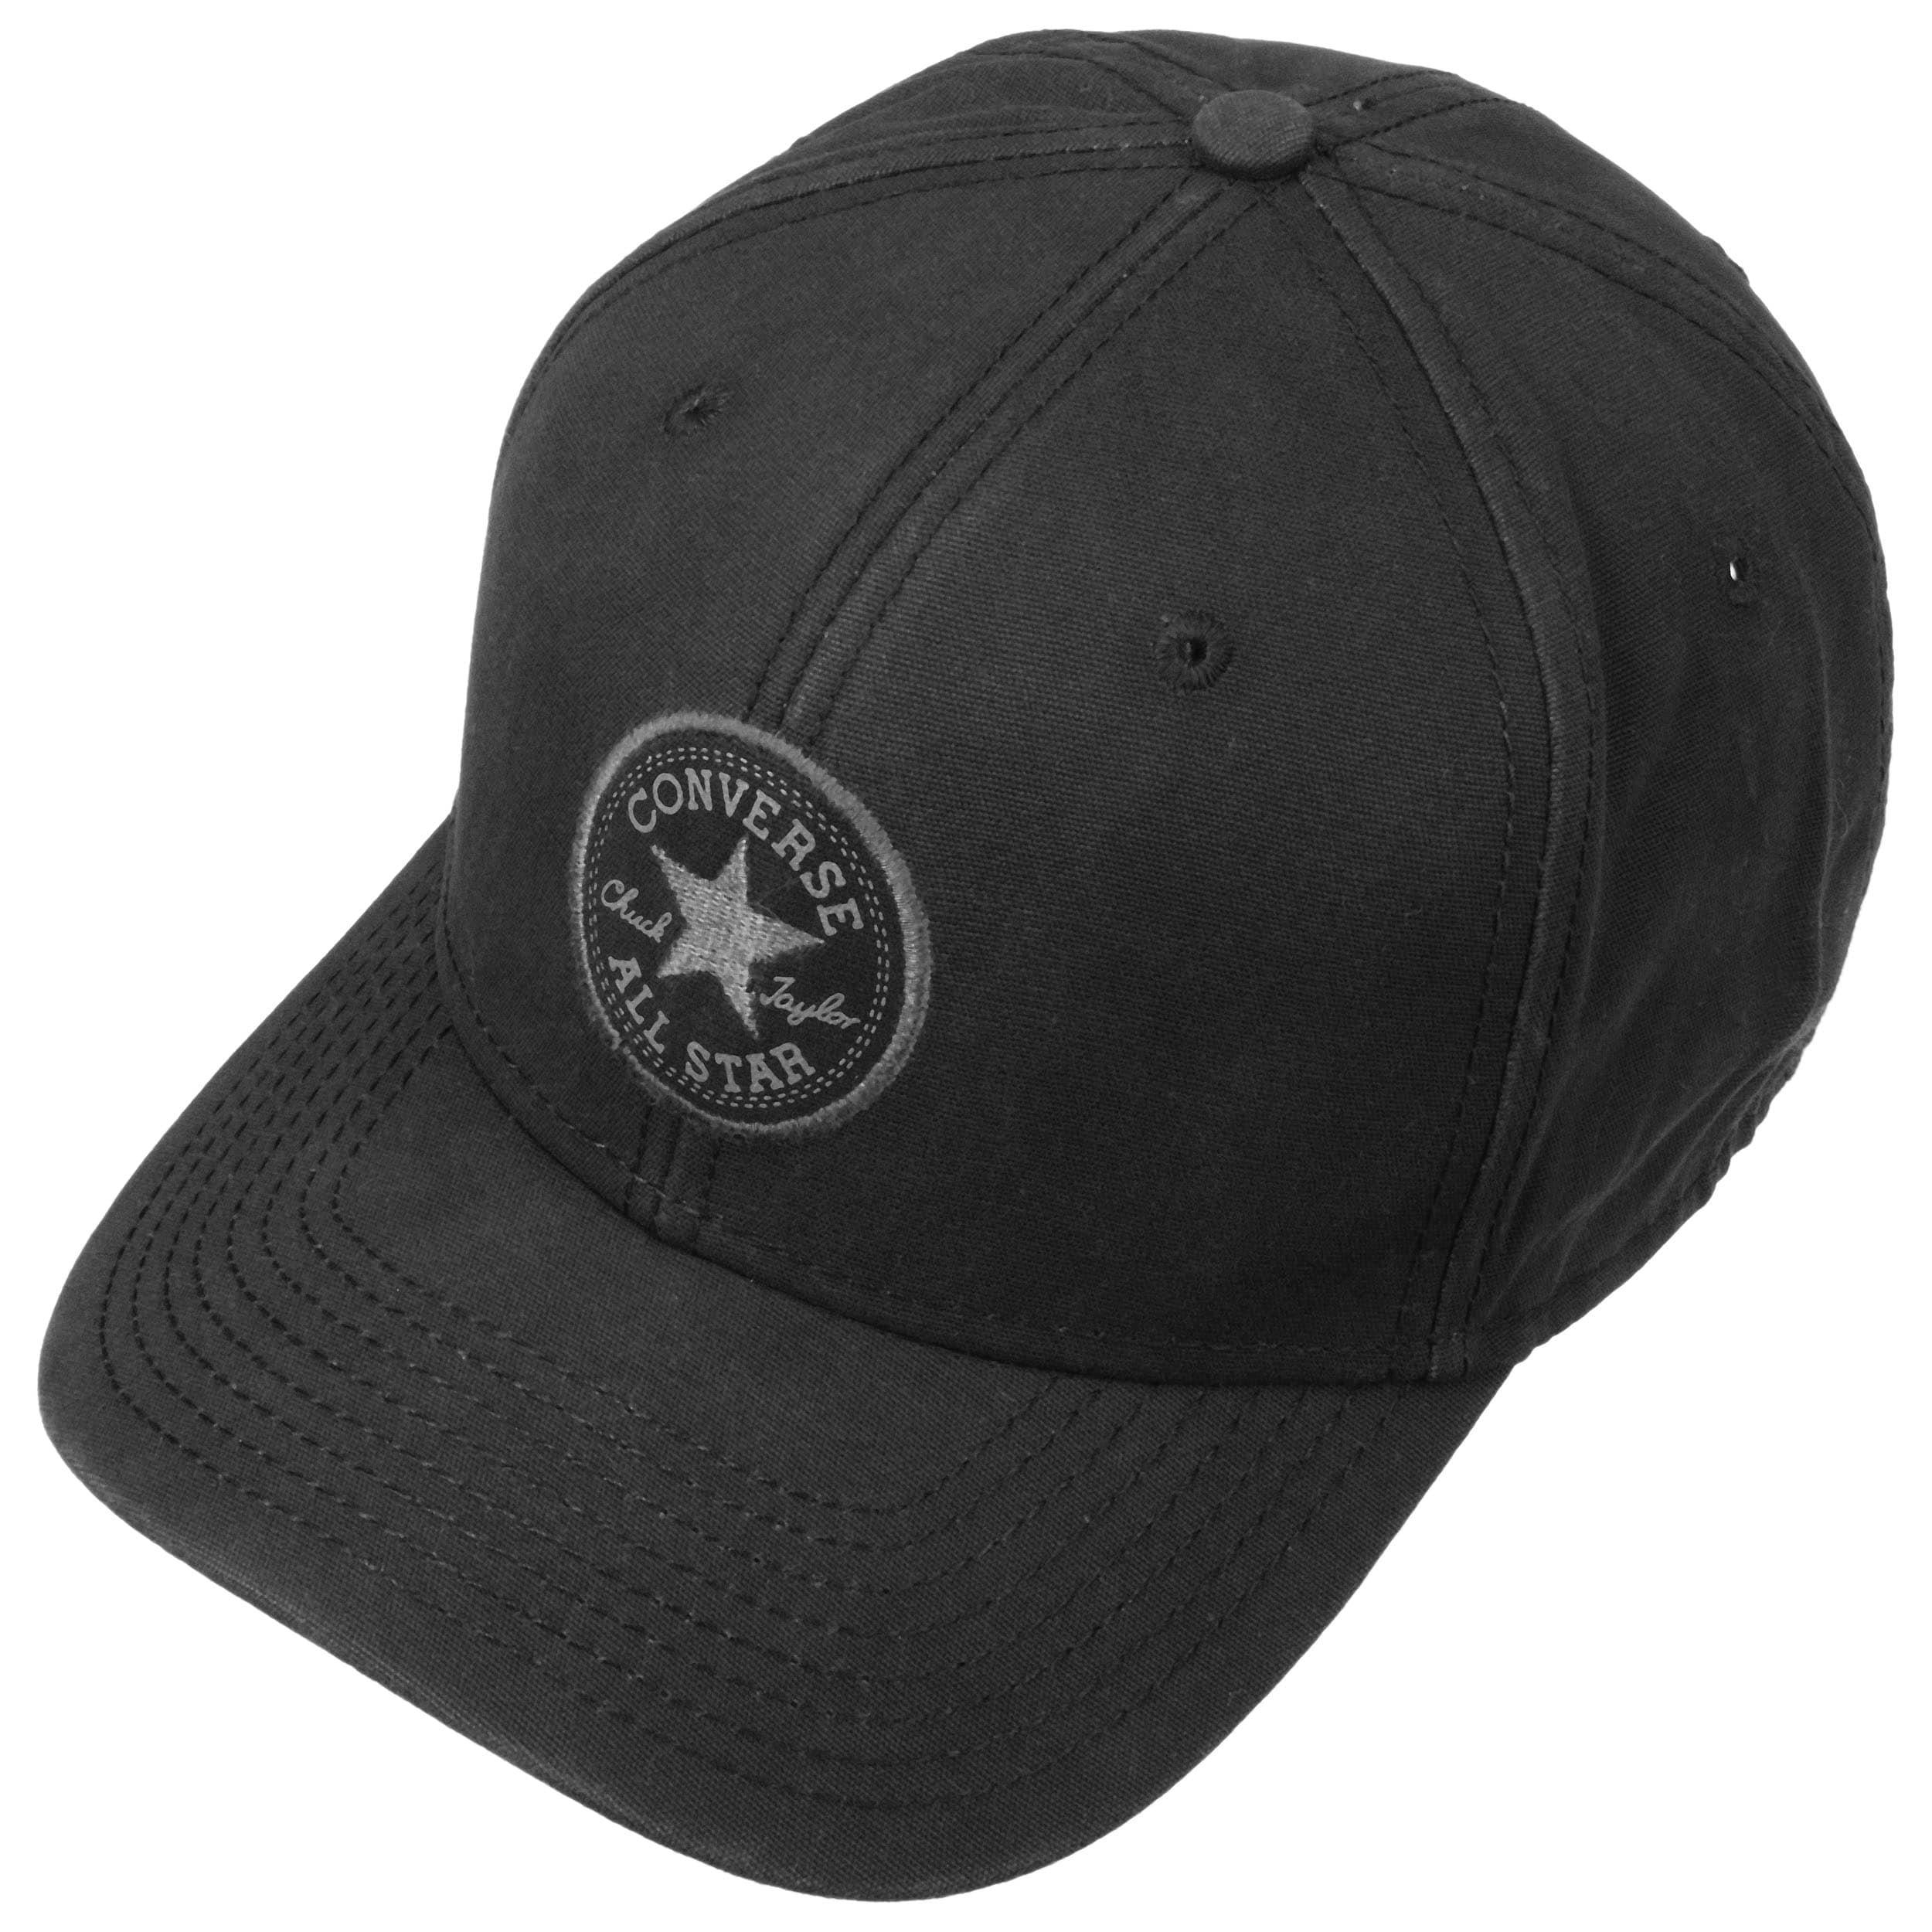 396901edf5bb4 ... Mild Curve Snapback Cap by Converse - black 1 ...